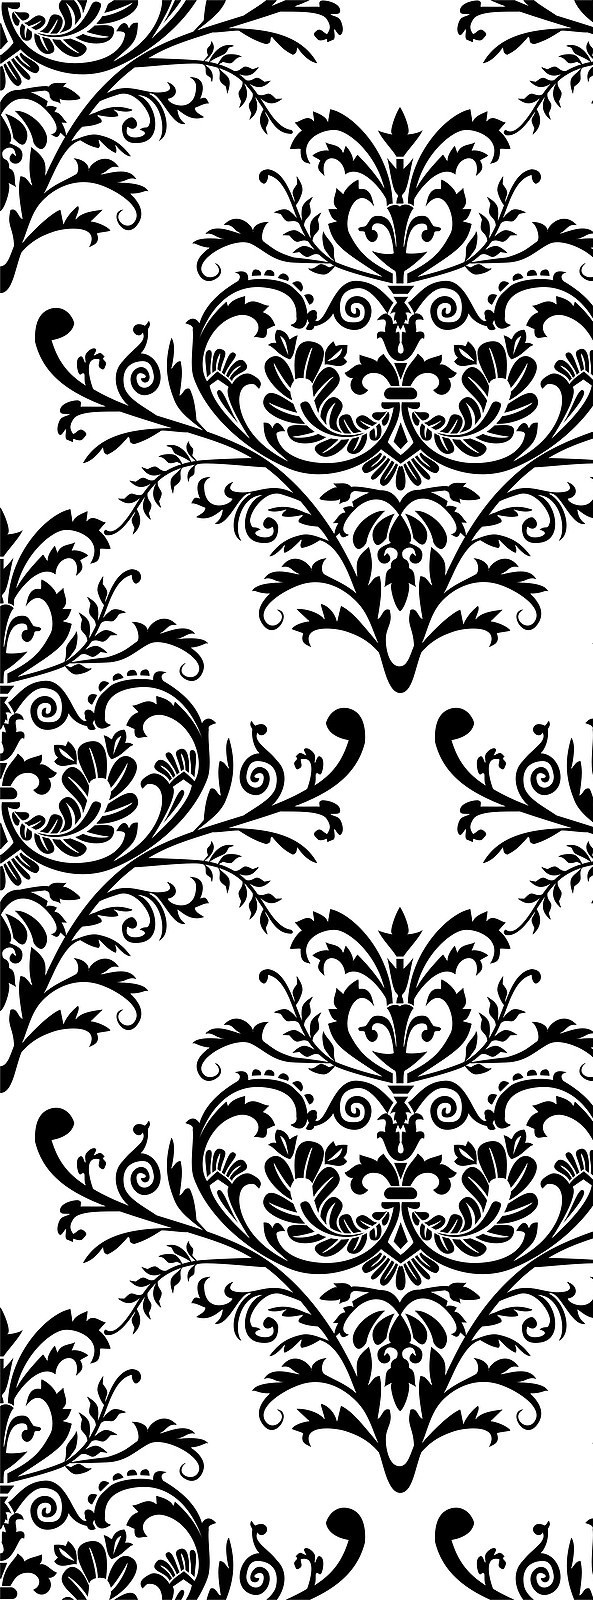 Baroque pattern black and white http://htctokok-infinity.hu , http://galaxytokok-infinity.hu , http://iphonetokok-infinity.hu